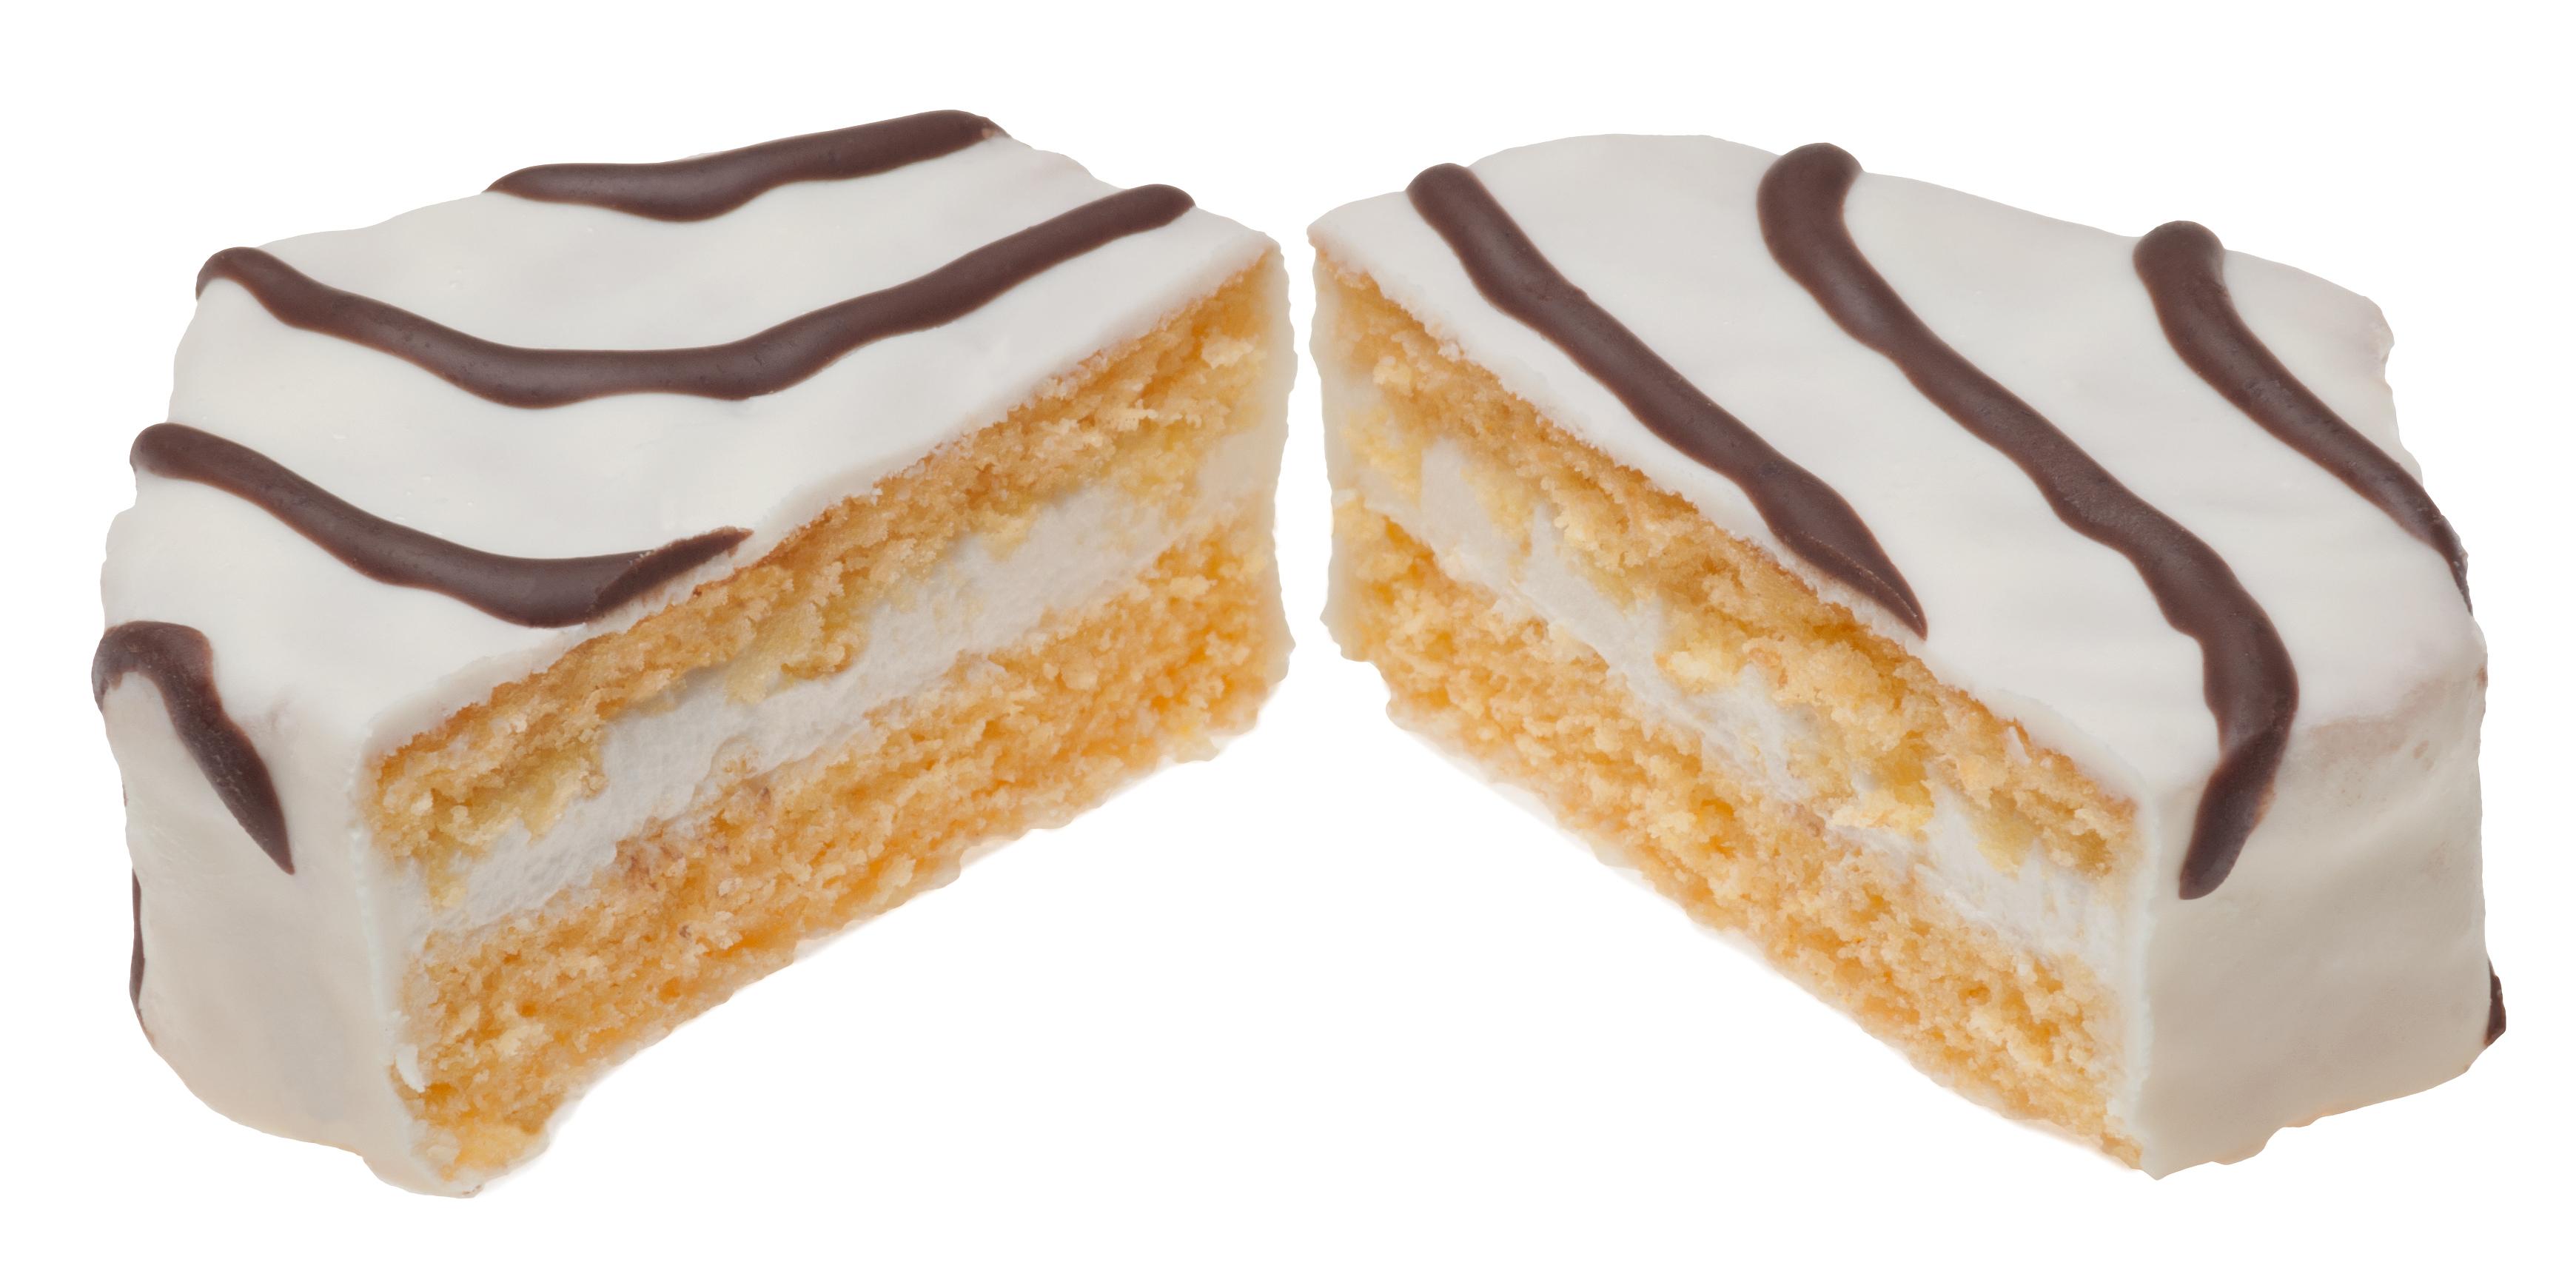 File:LD-Zebra-Cakes.jpg - Wikimedia Commons